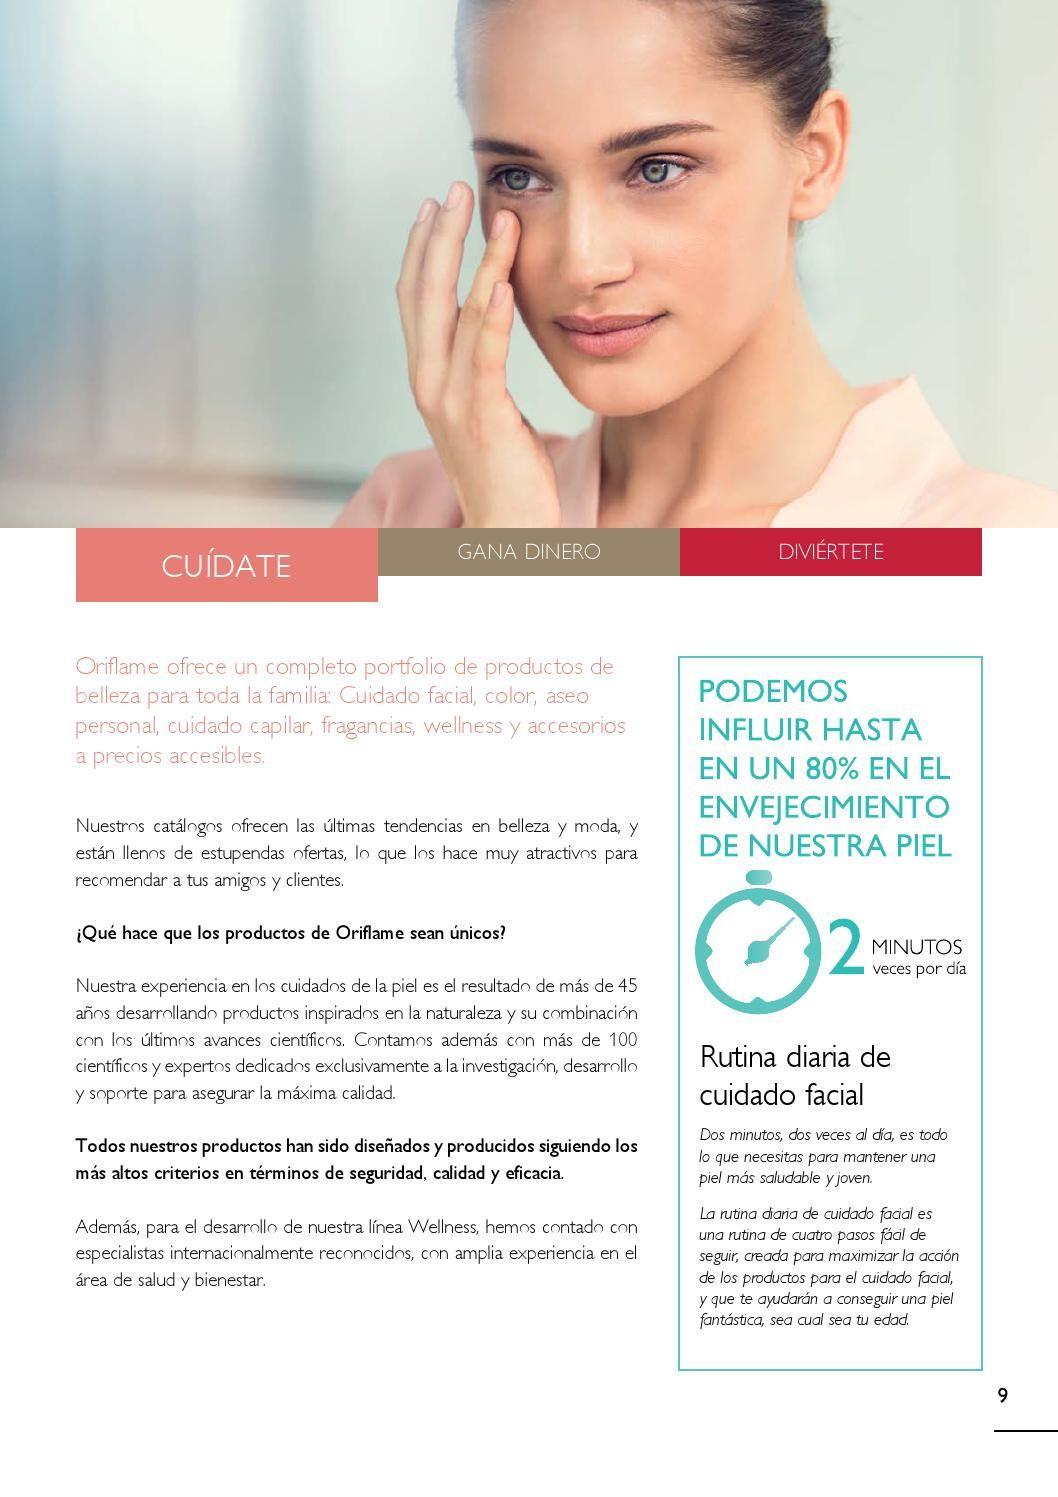 Plan2015 Web Productos Oriflame Cuidado Facial Oriflame Cosmeticos